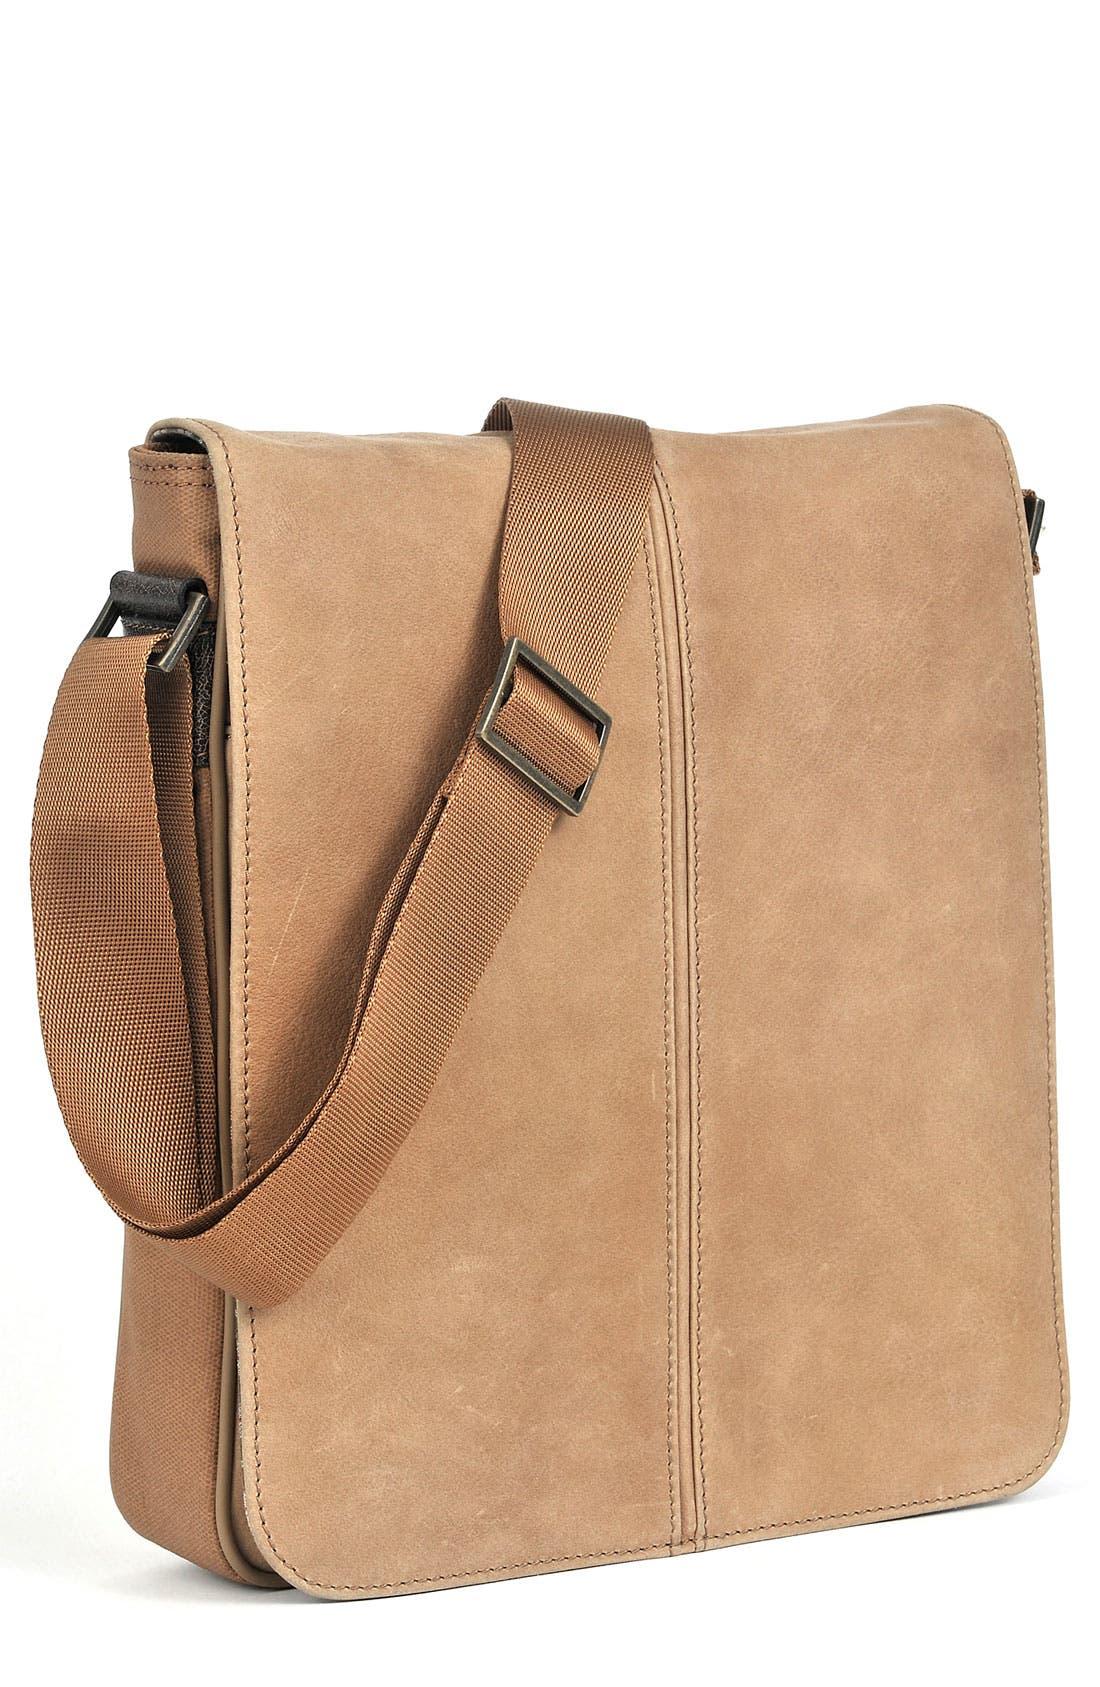 Alternate Image 1 Selected - Boconi 'Leon Mailbag' Calfskin Leather Crossbody Bag